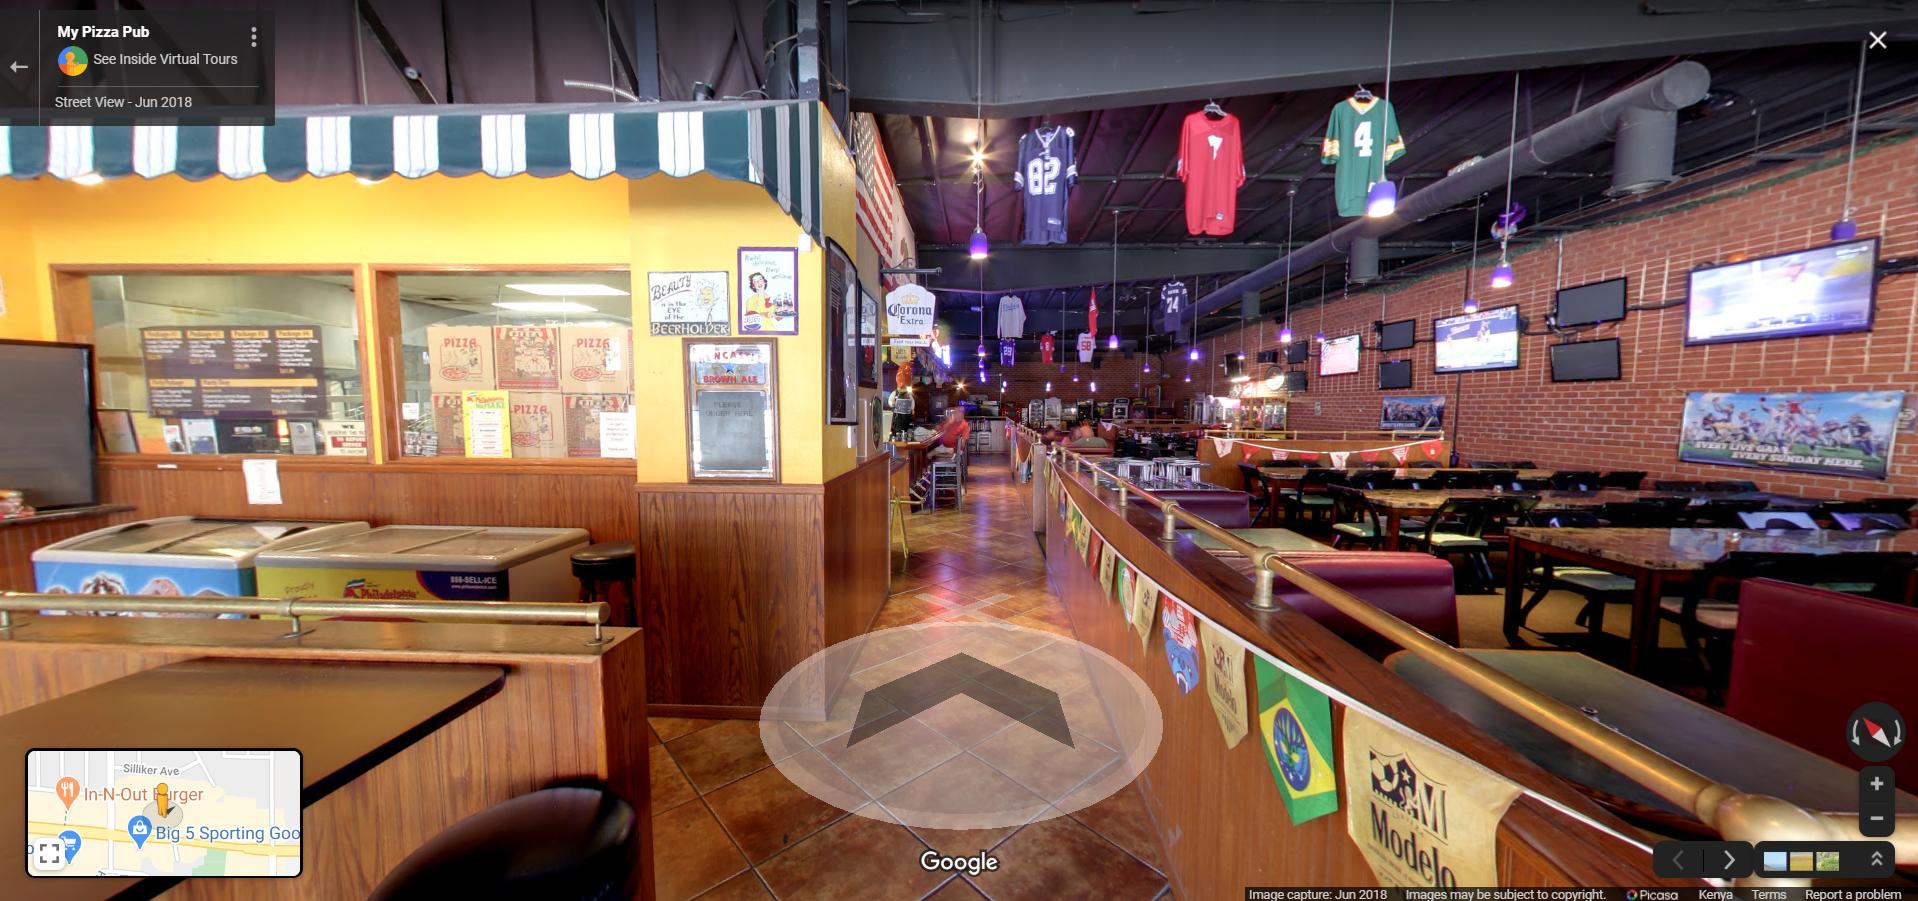 My Pizza Pub  La Habra